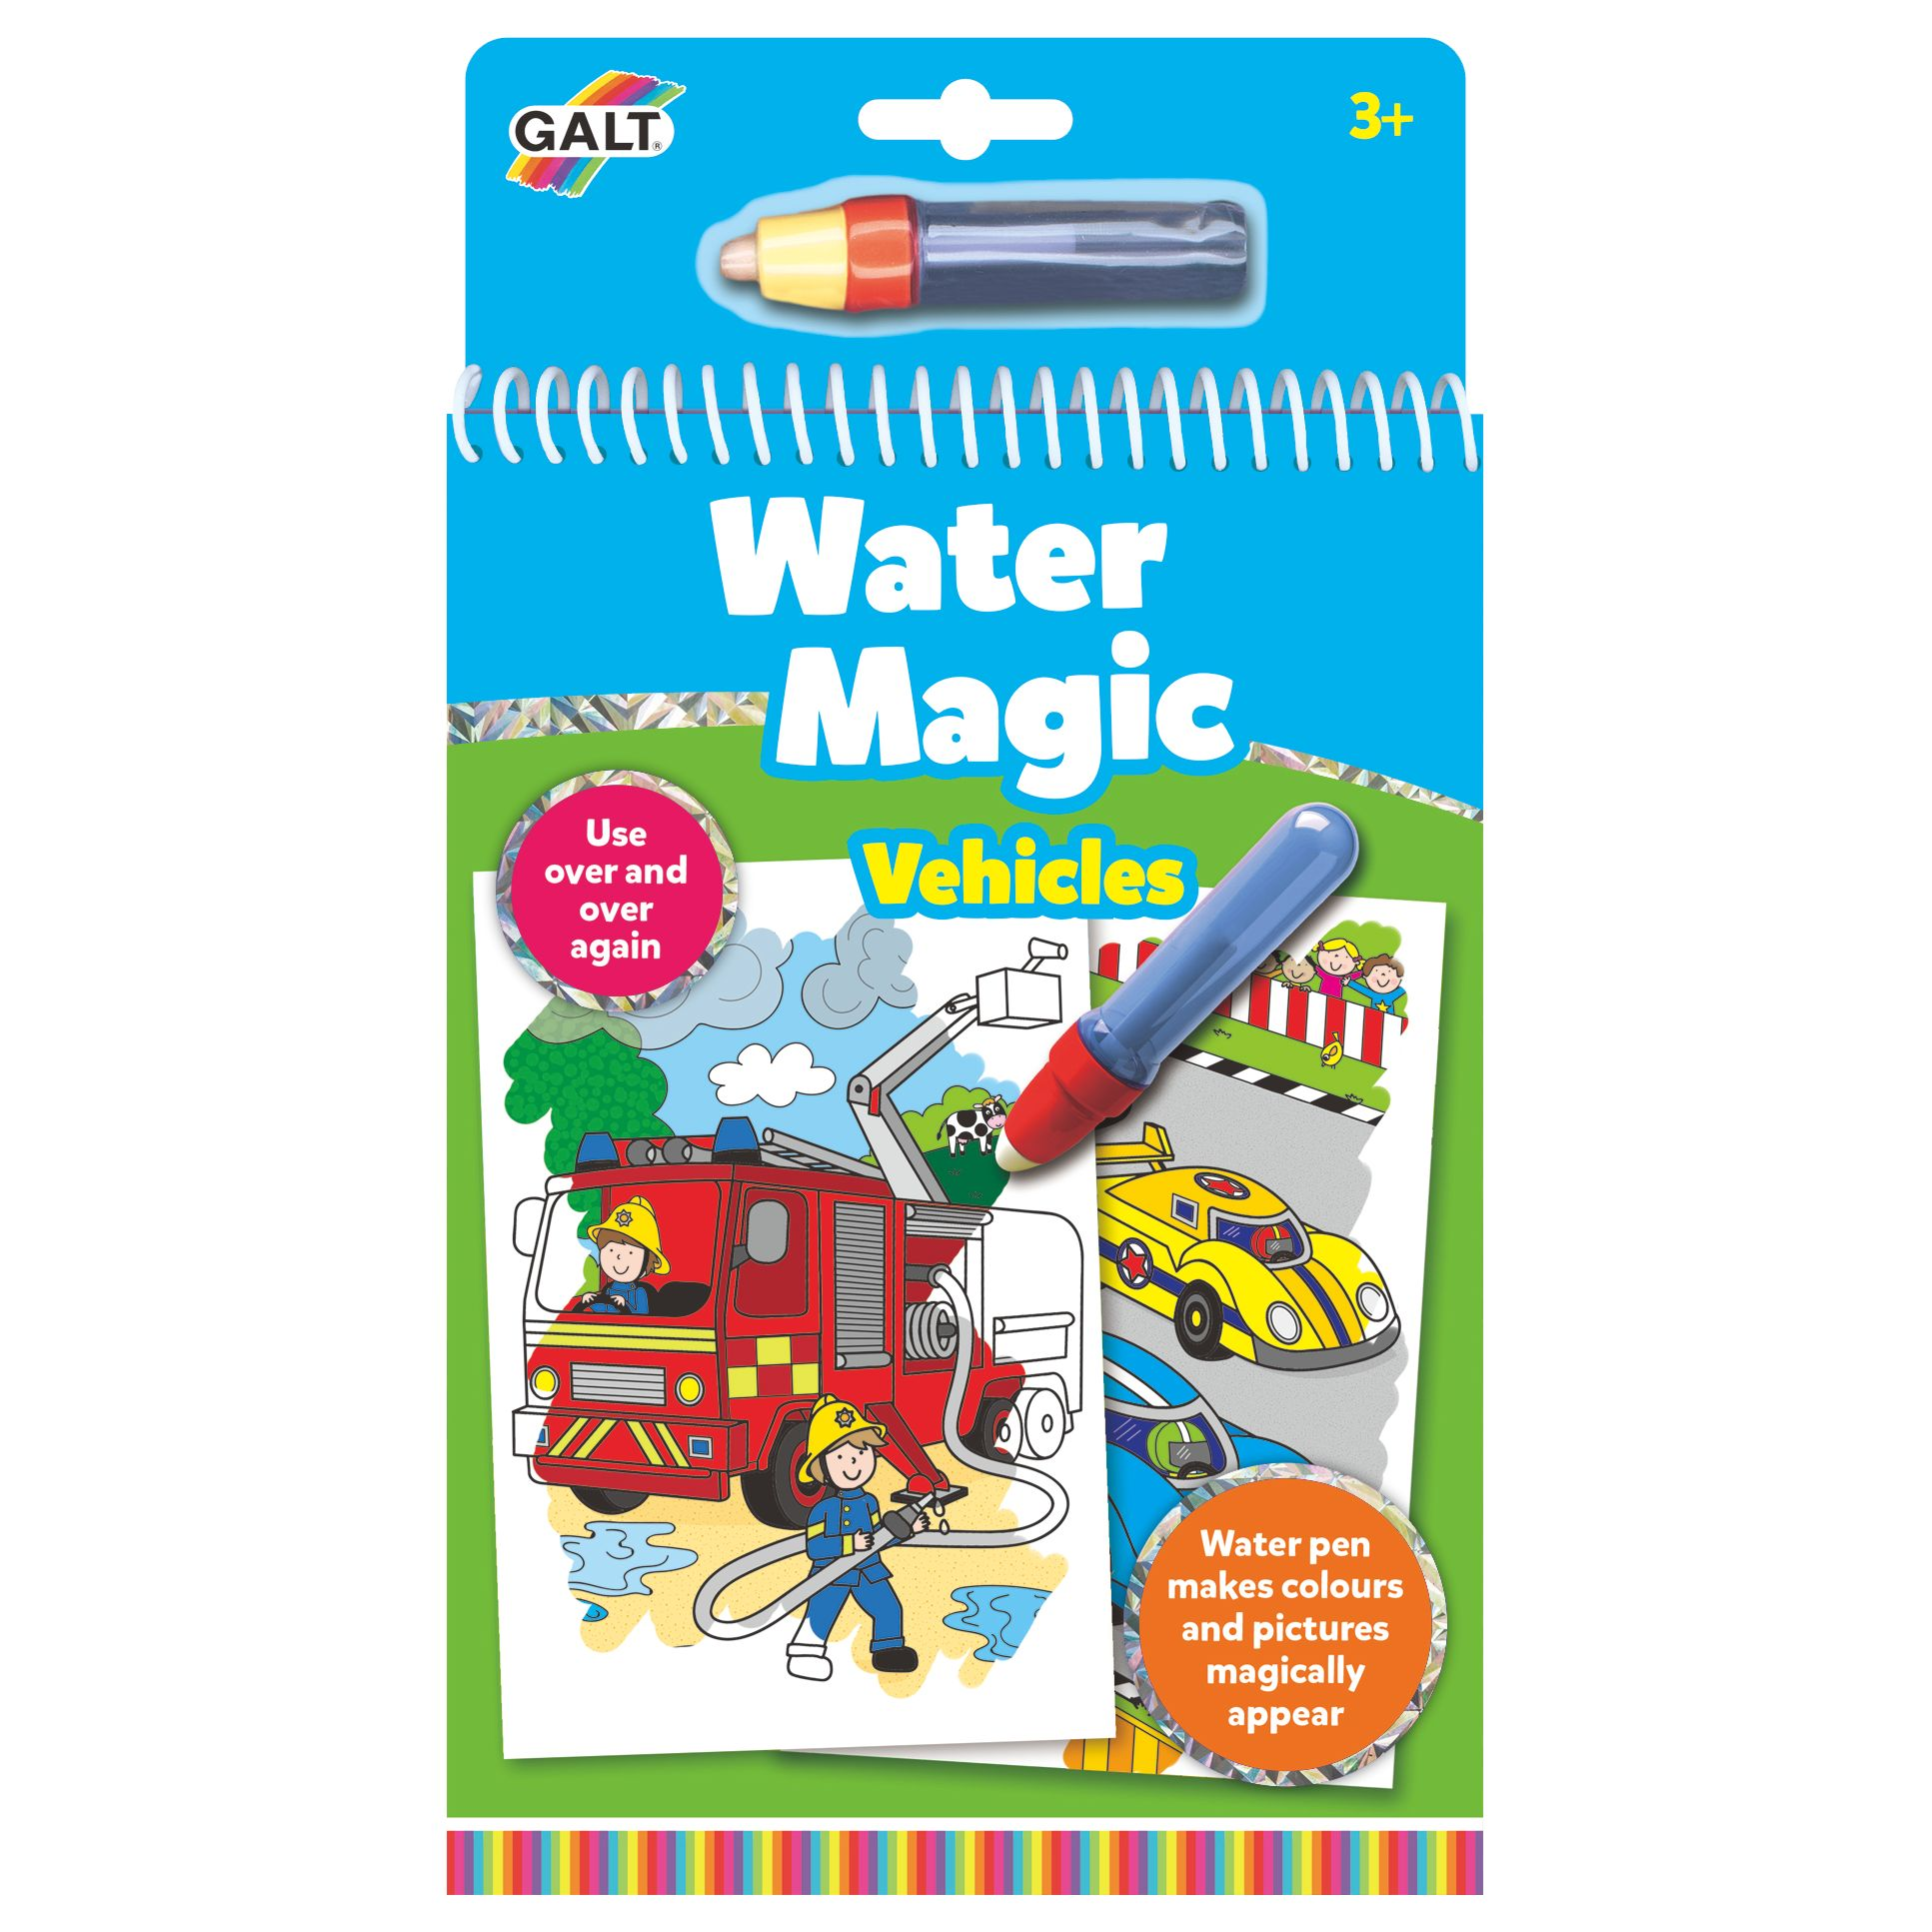 Galt Galt Water Magic Vehicles Colouring